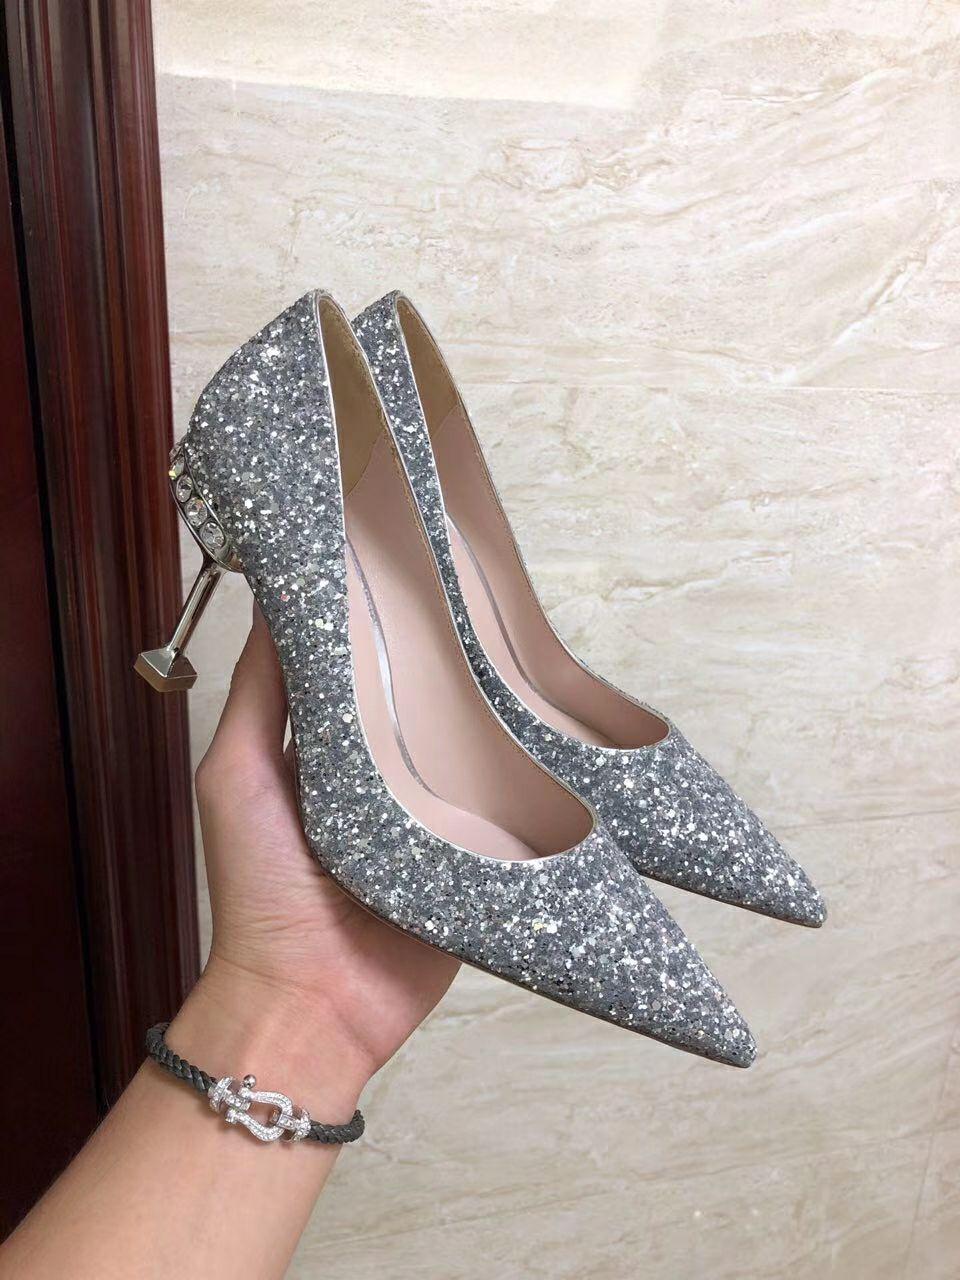 MIU MIU GLITTER FABRIC PUMPS 85 mm heel with crystals SI  ER  3